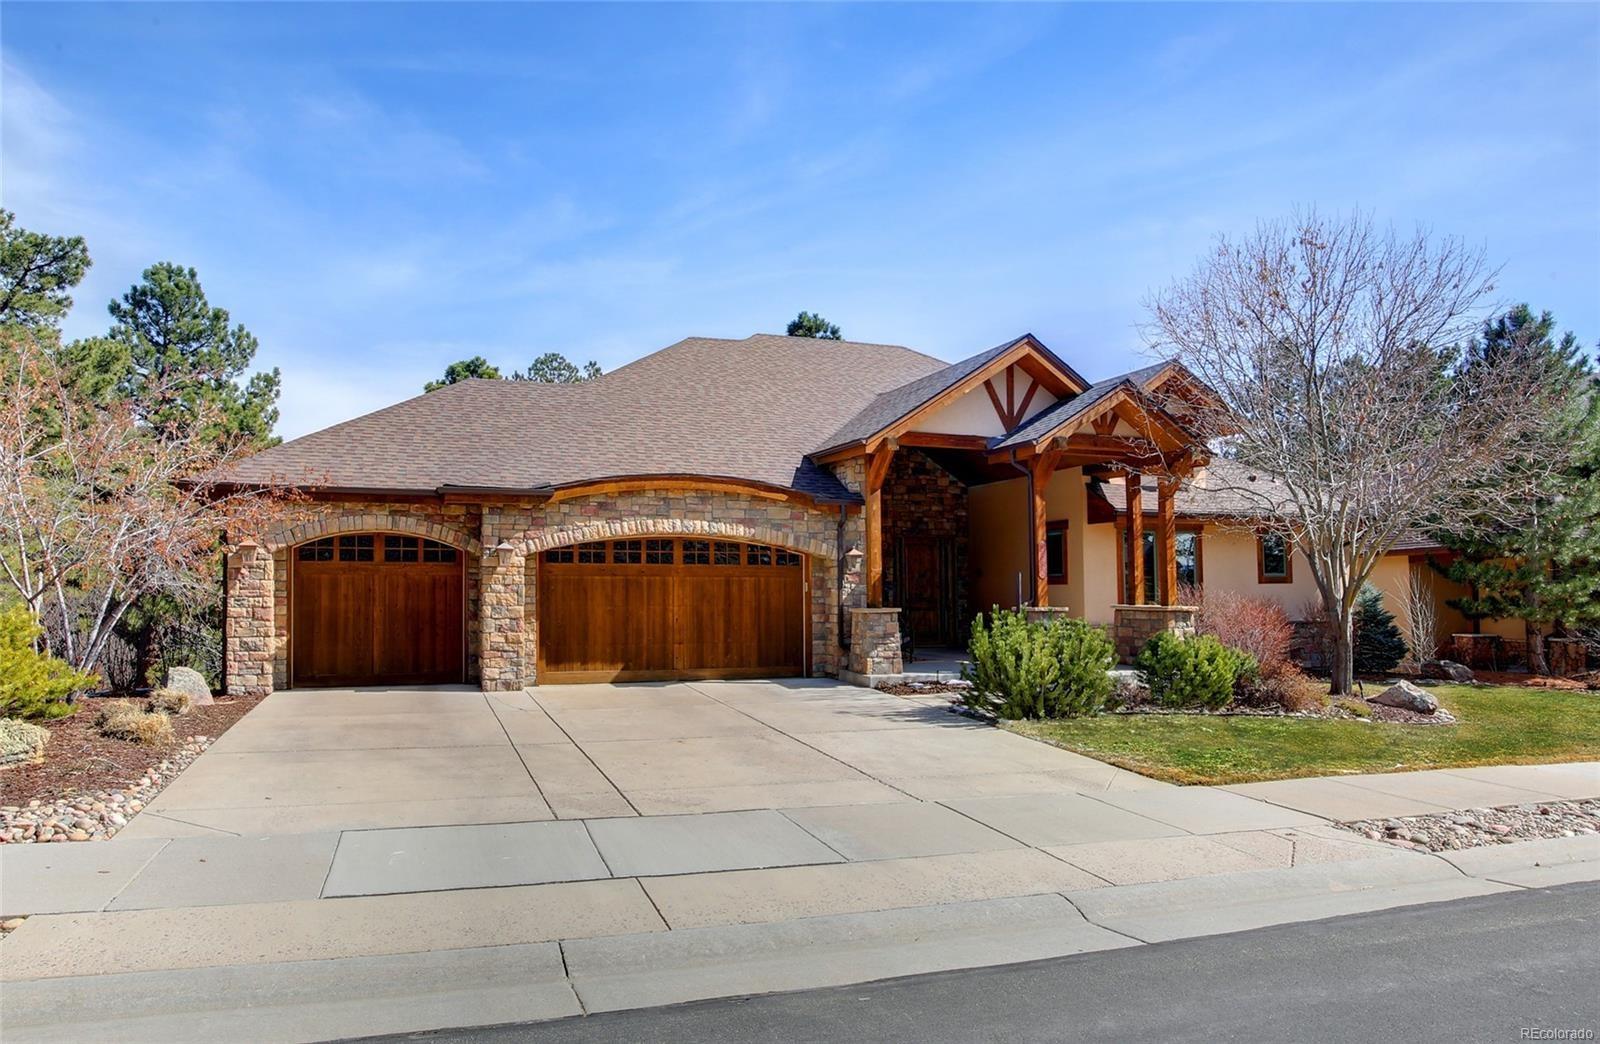 MLS# 4879945 - 1 - 2392 Saddleback Drive, Castle Rock, CO 80104